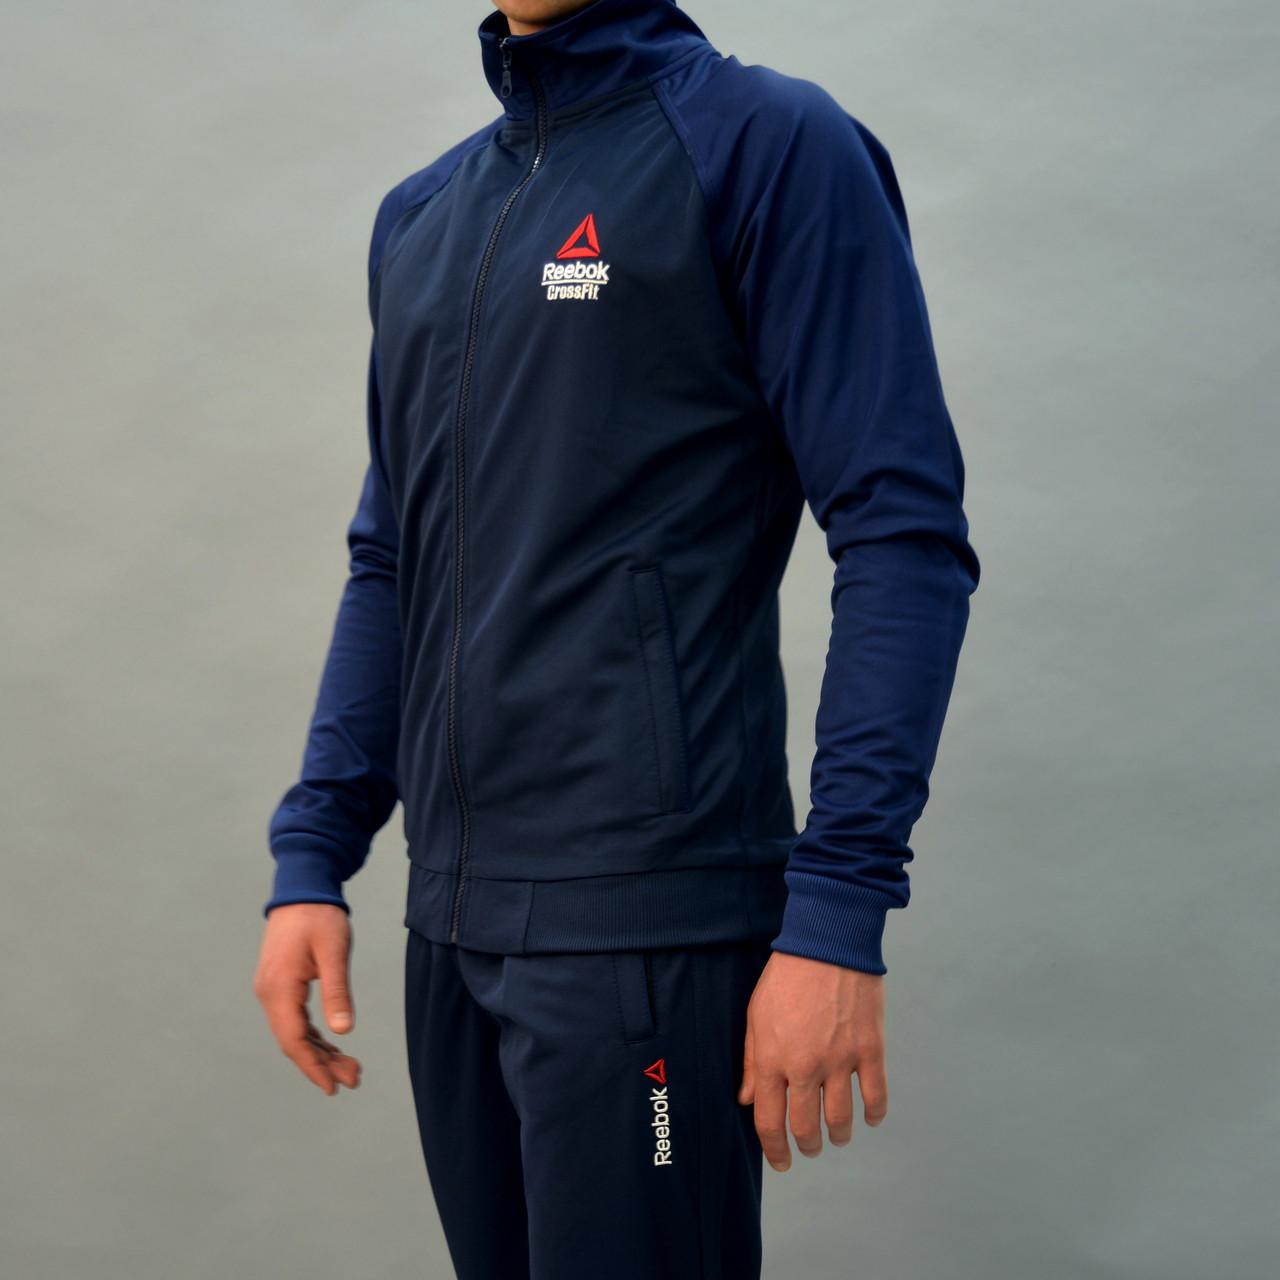 f6e597ca Размеры: 46,48. Темно-синий мужской спортивный костюм Reebok ...